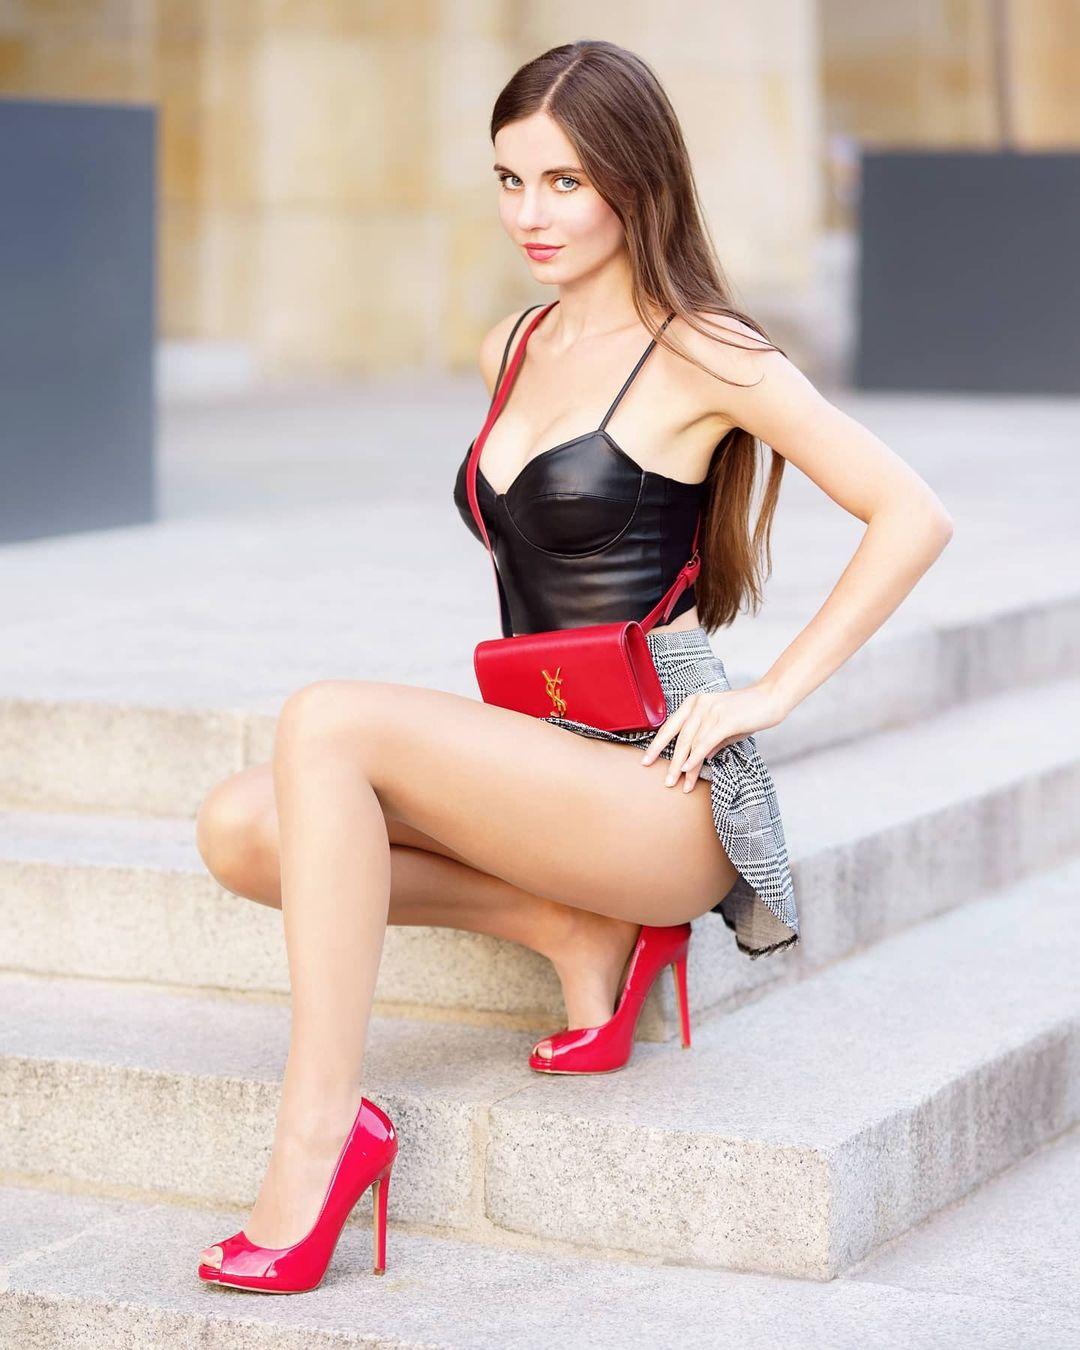 Ariadna - девушка дня из инстаграм (27 Фото) 9